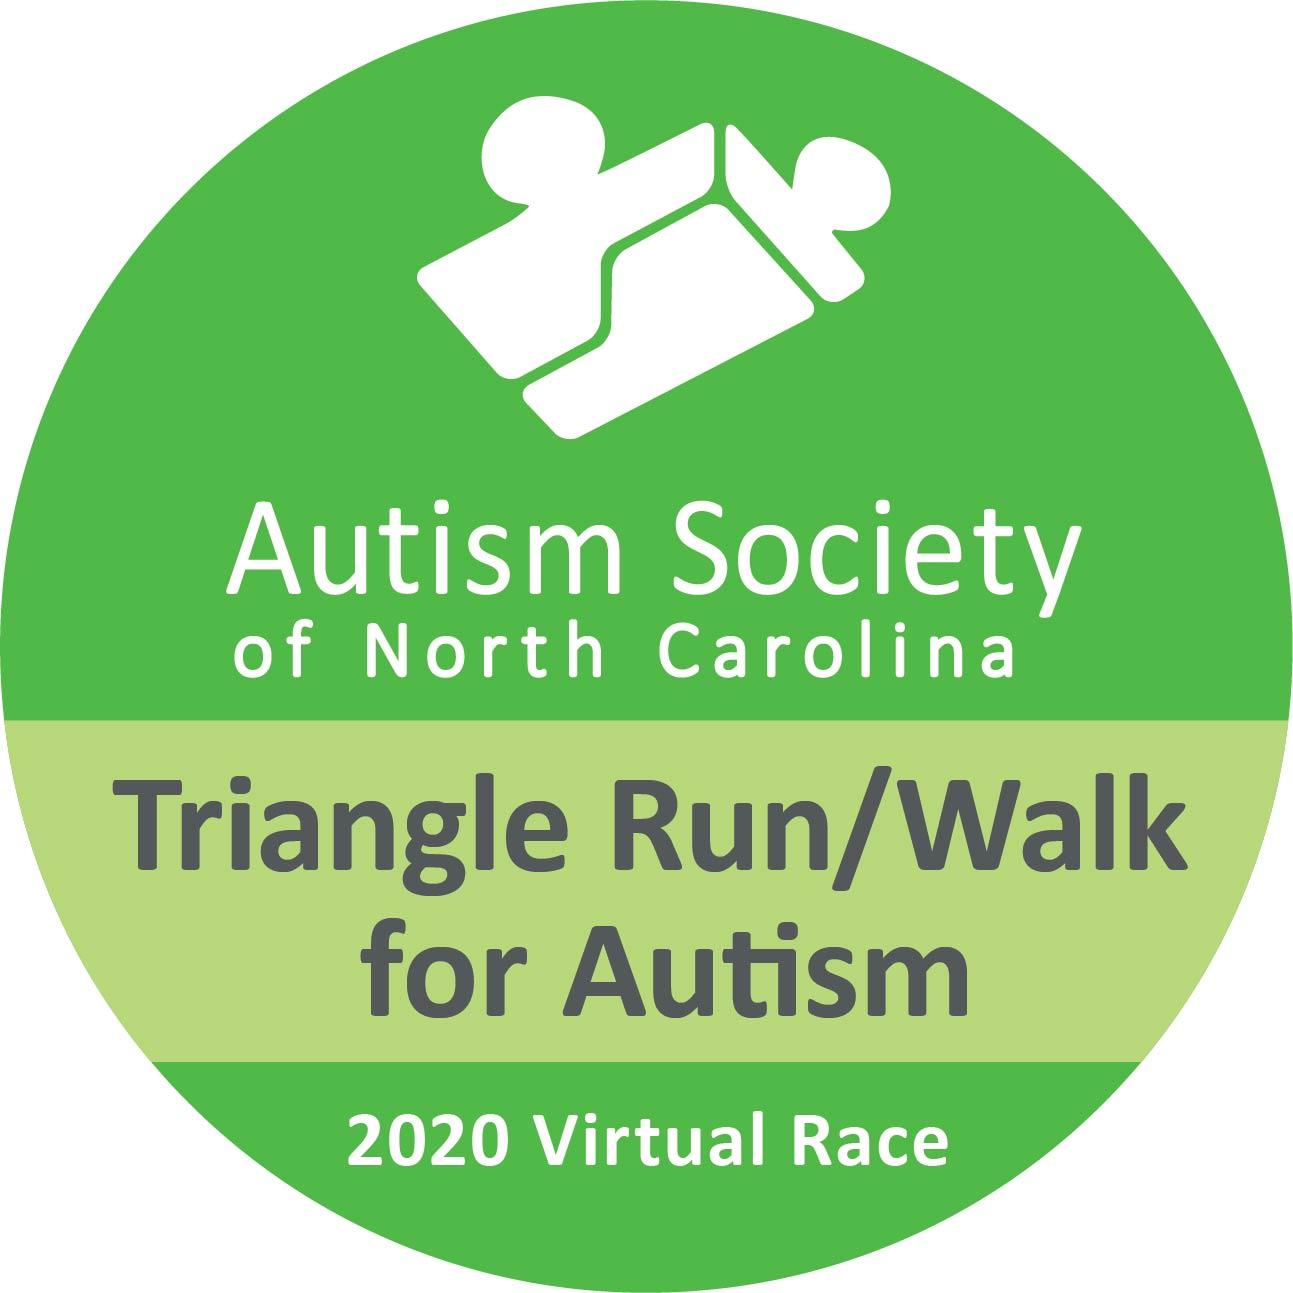 2020 Virtual Triangle Run/Walk for Autism